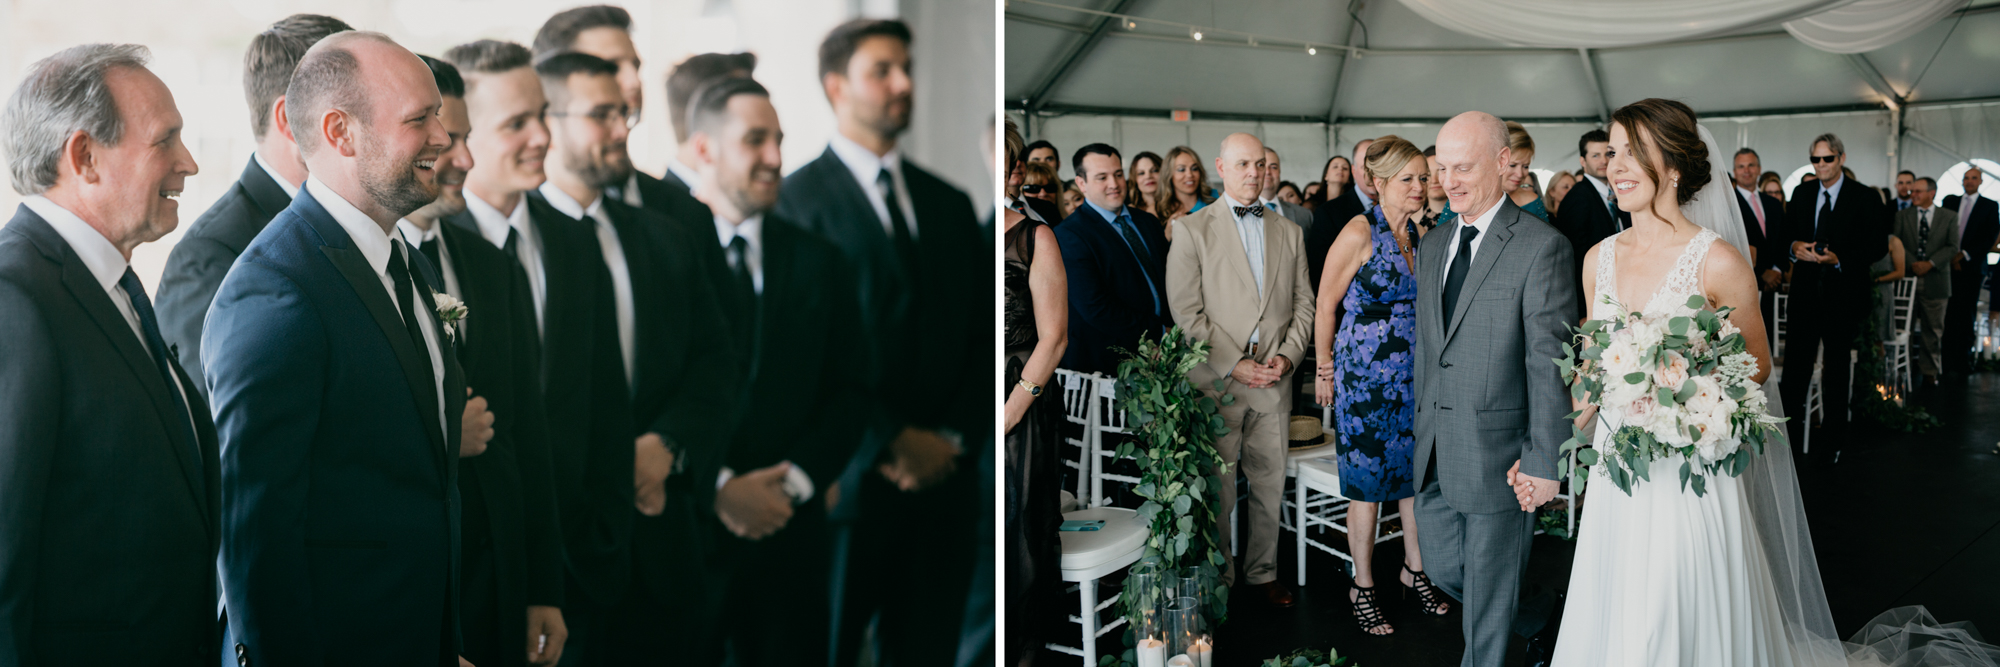 Jaclyn_Andrew_quincy_massachusetts_wedding012.jpg